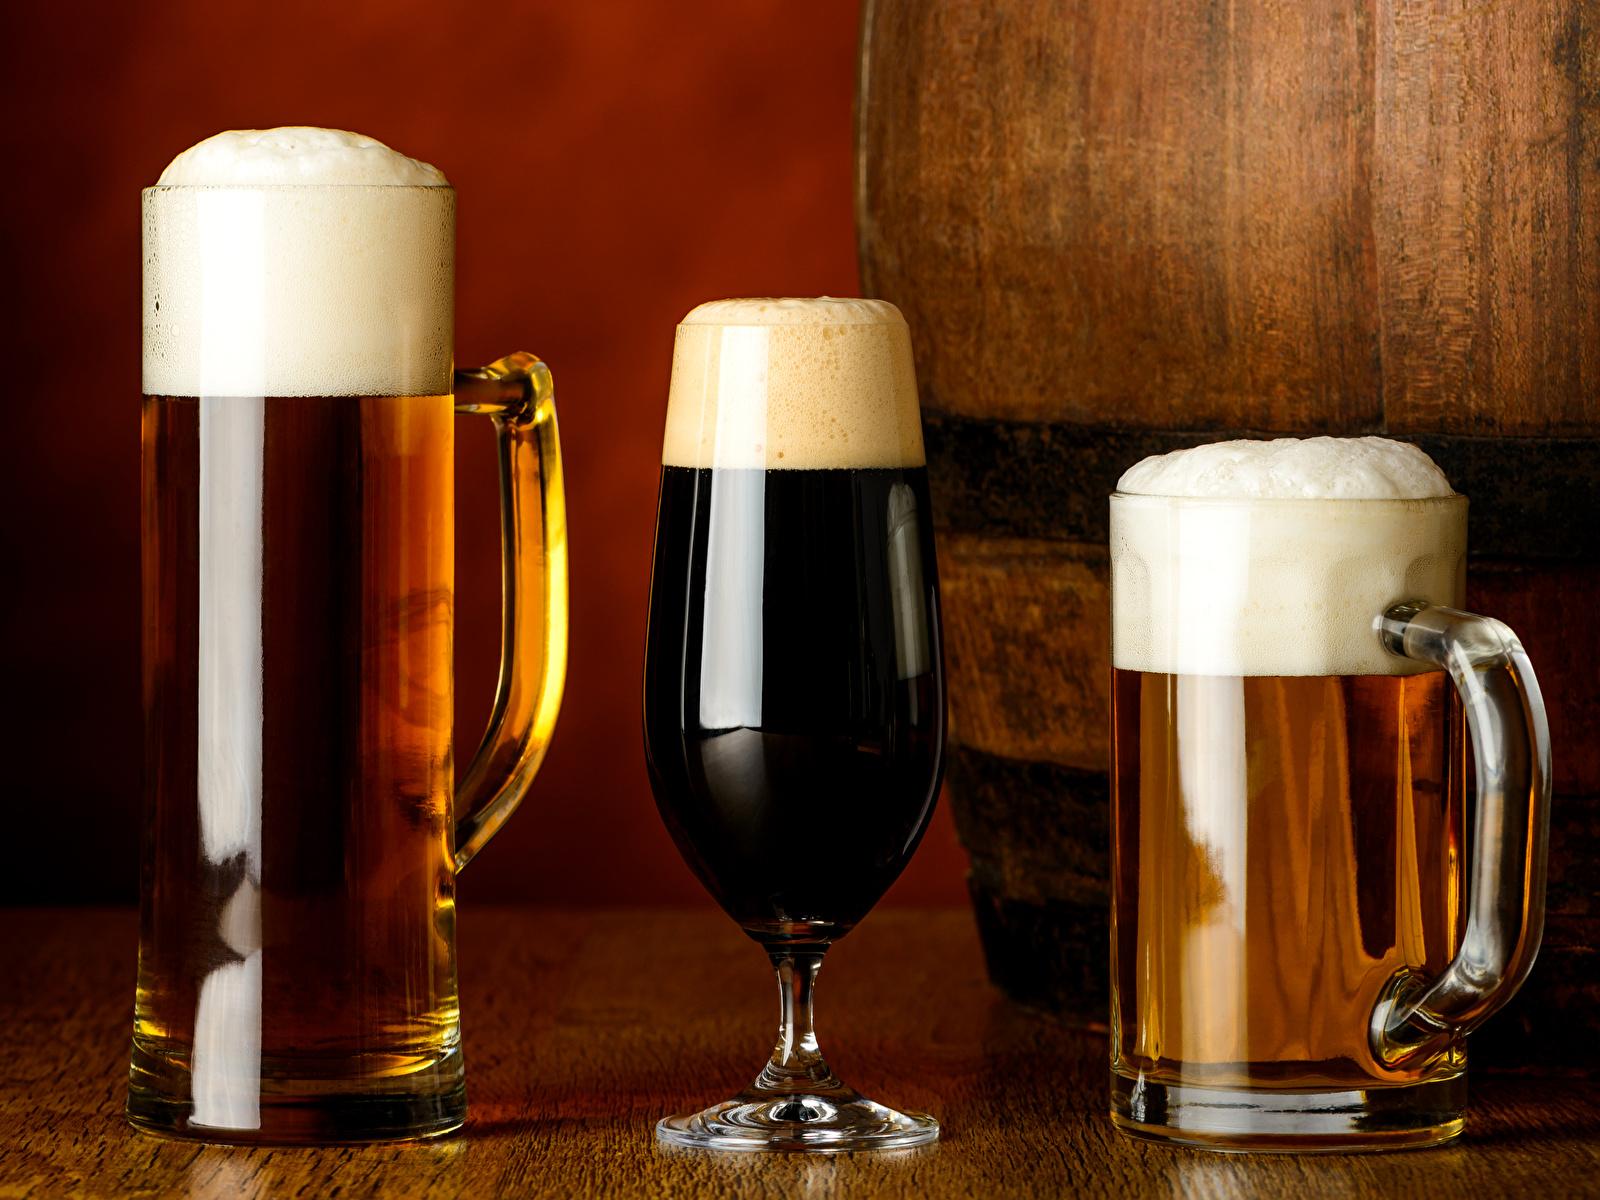 Images Beer Mug Foam Food Three 3 Drinks 1600x1200